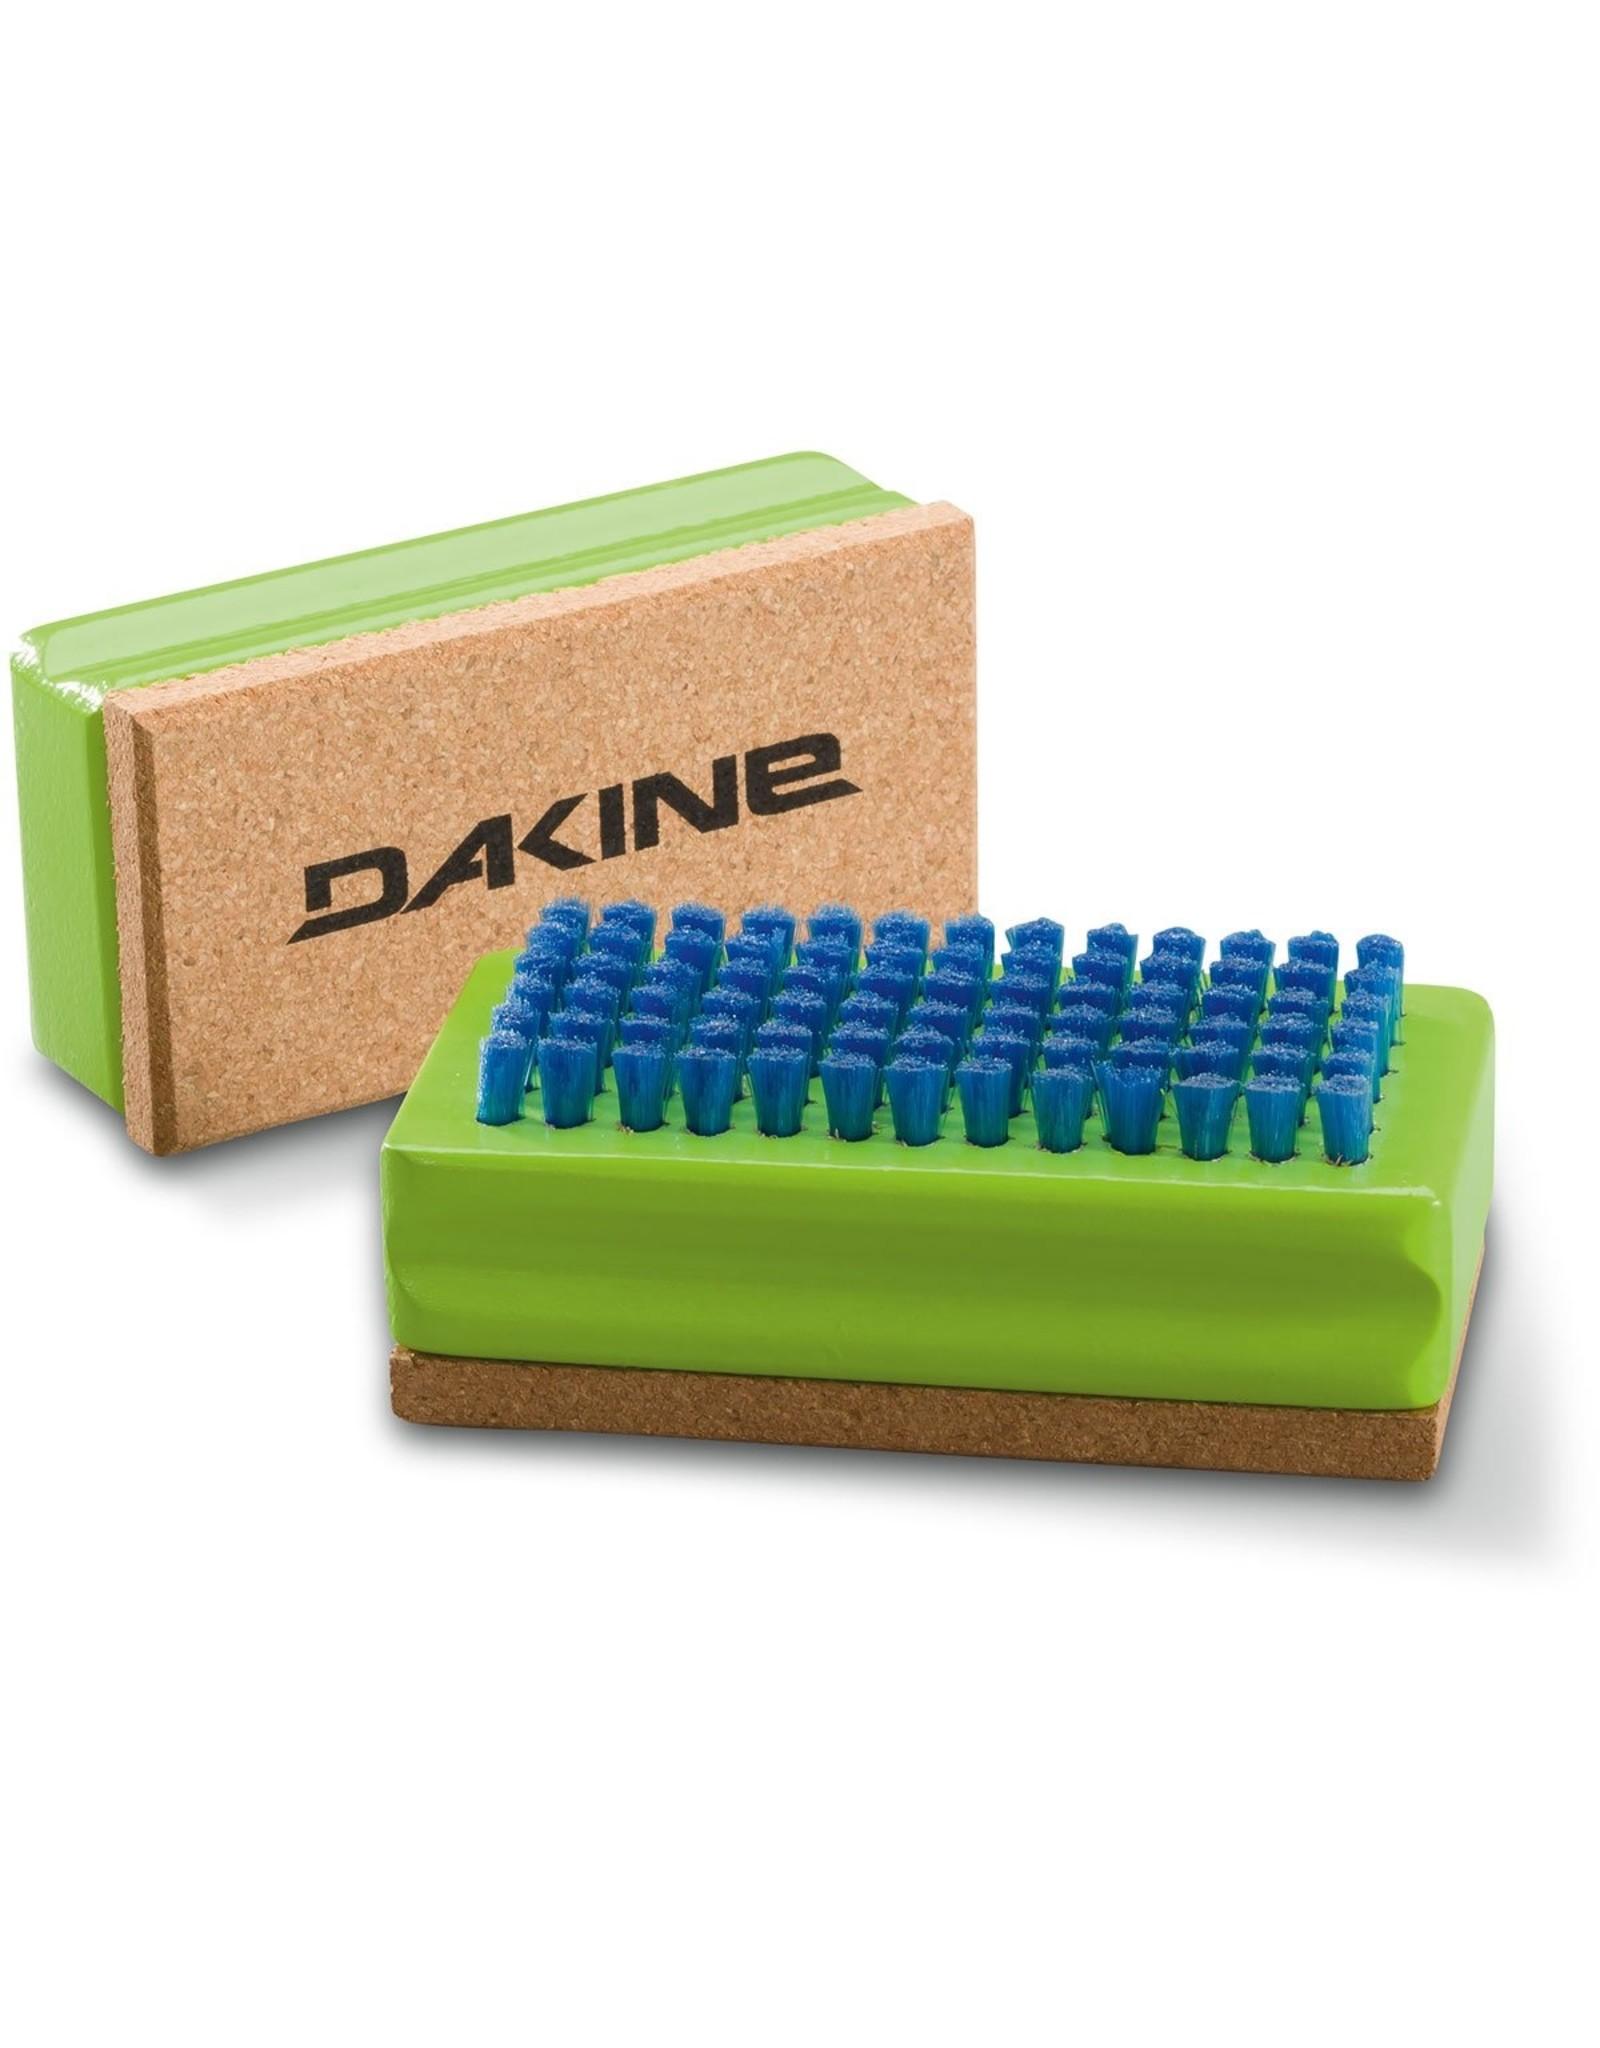 DAKINE DAKINE - NYLON/CORK BRUSH - GREEN